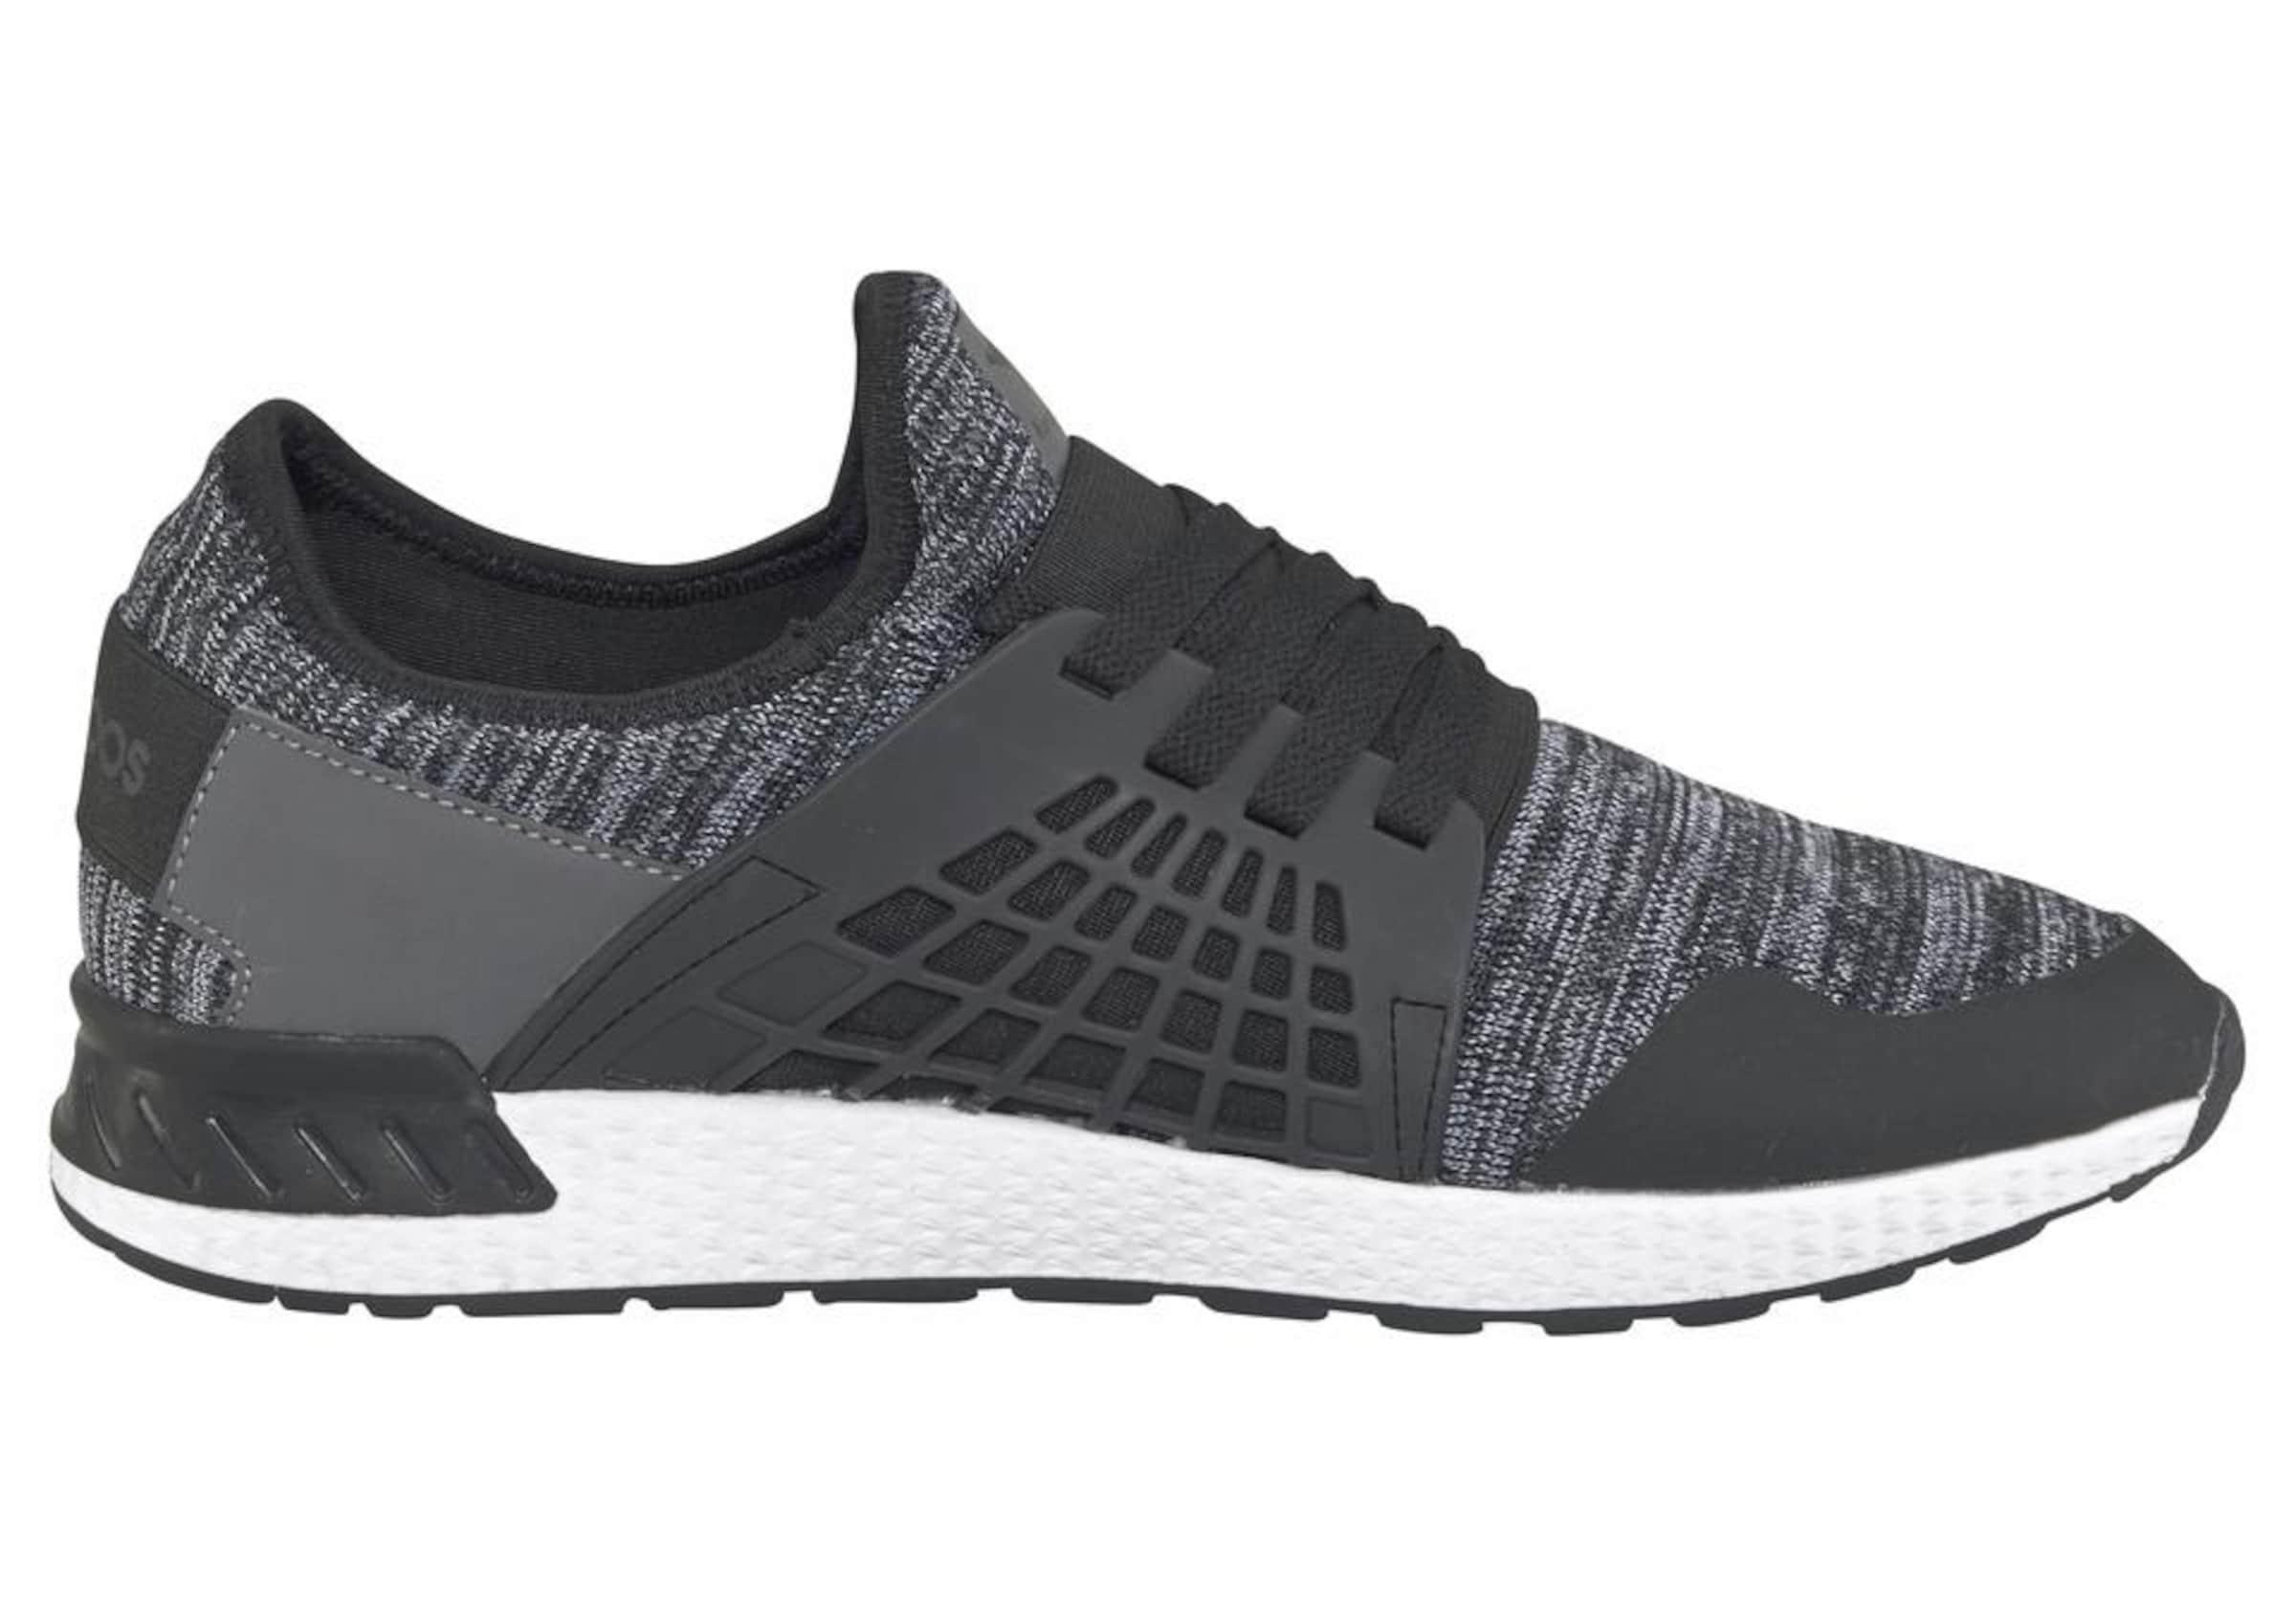 KangaROOS Sneaker 'W-500' Billige Footaction 1AacBQBEf4